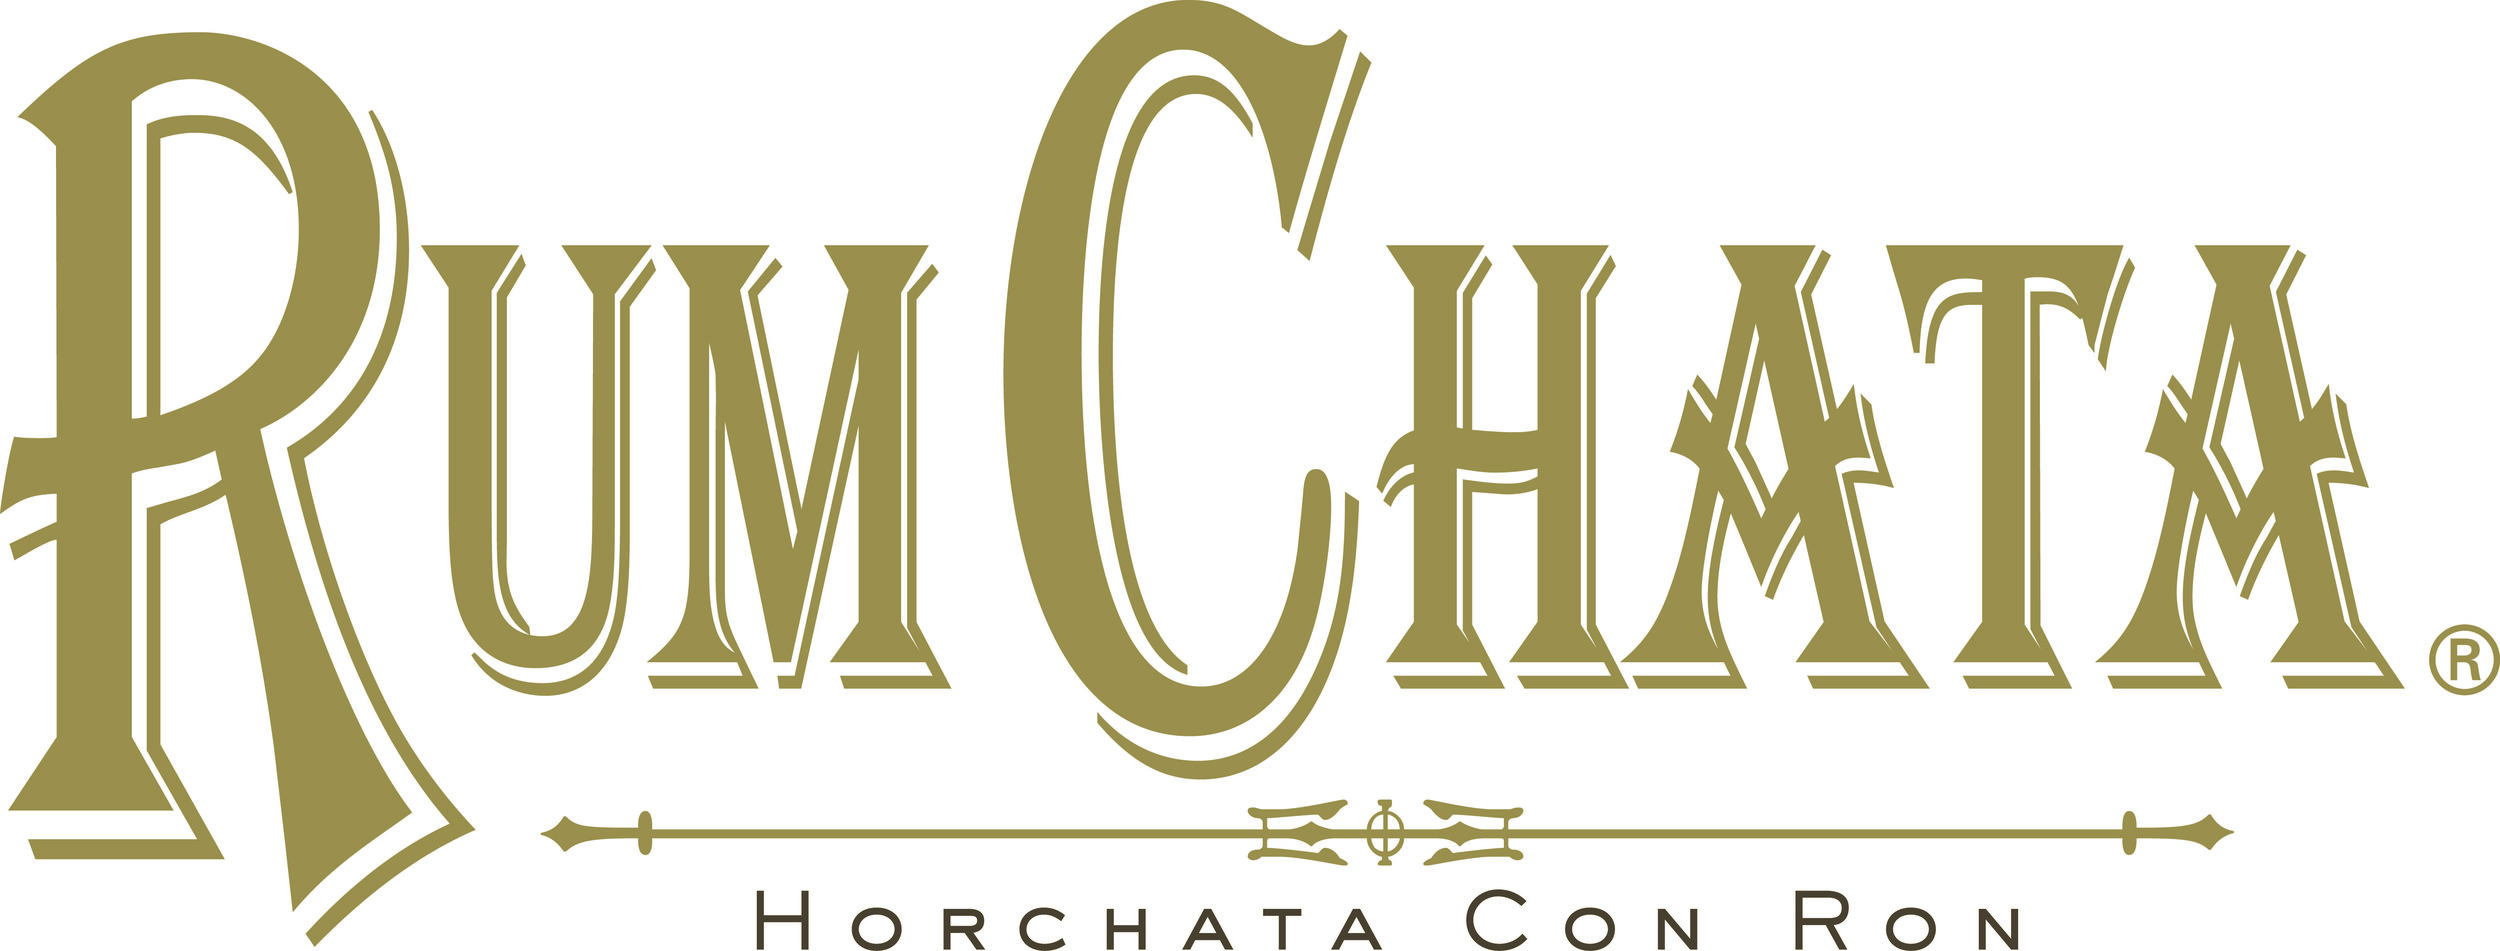 rumchata-logo-hi-res.jpg